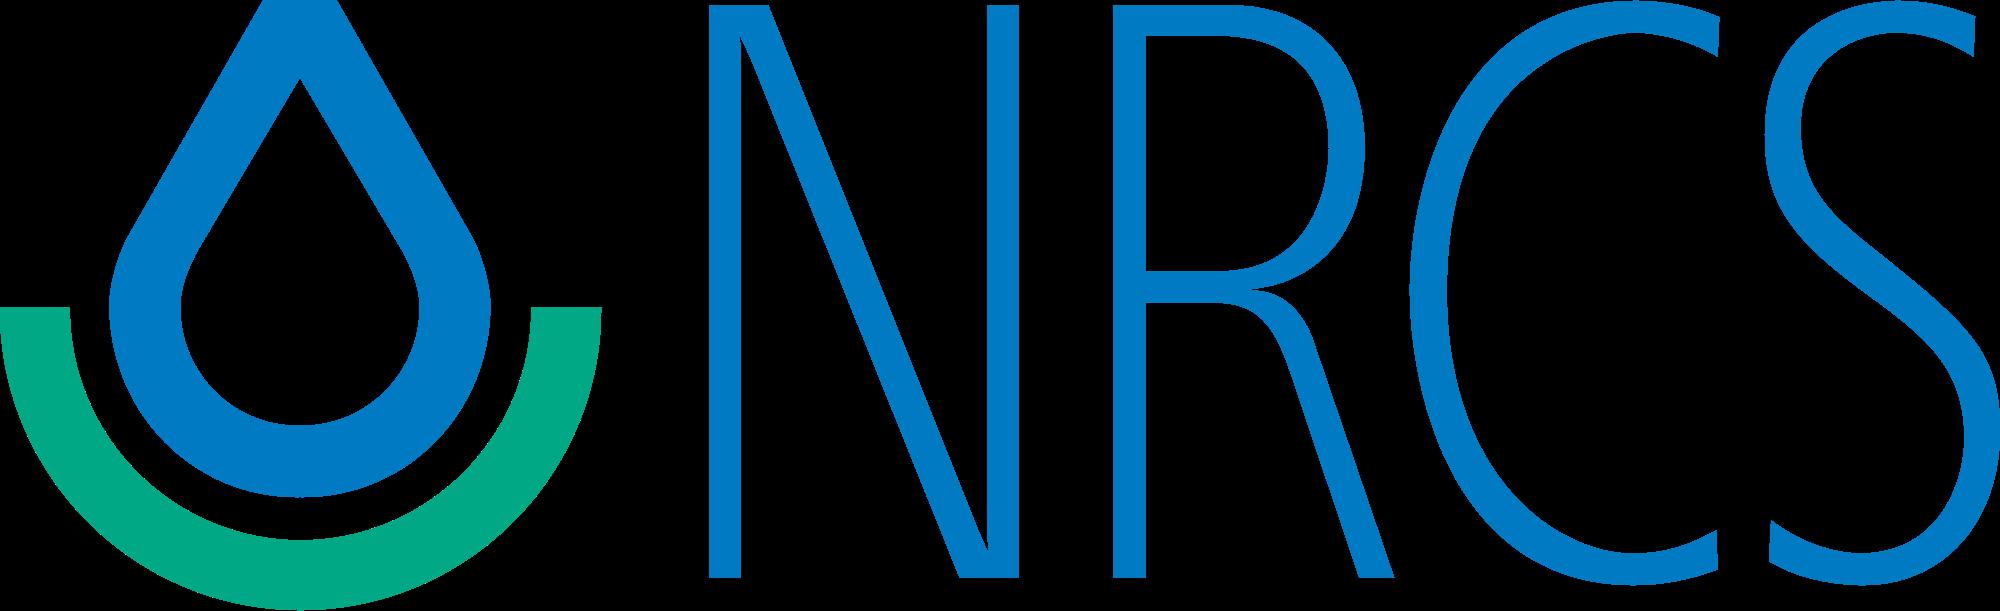 NRCS_clear